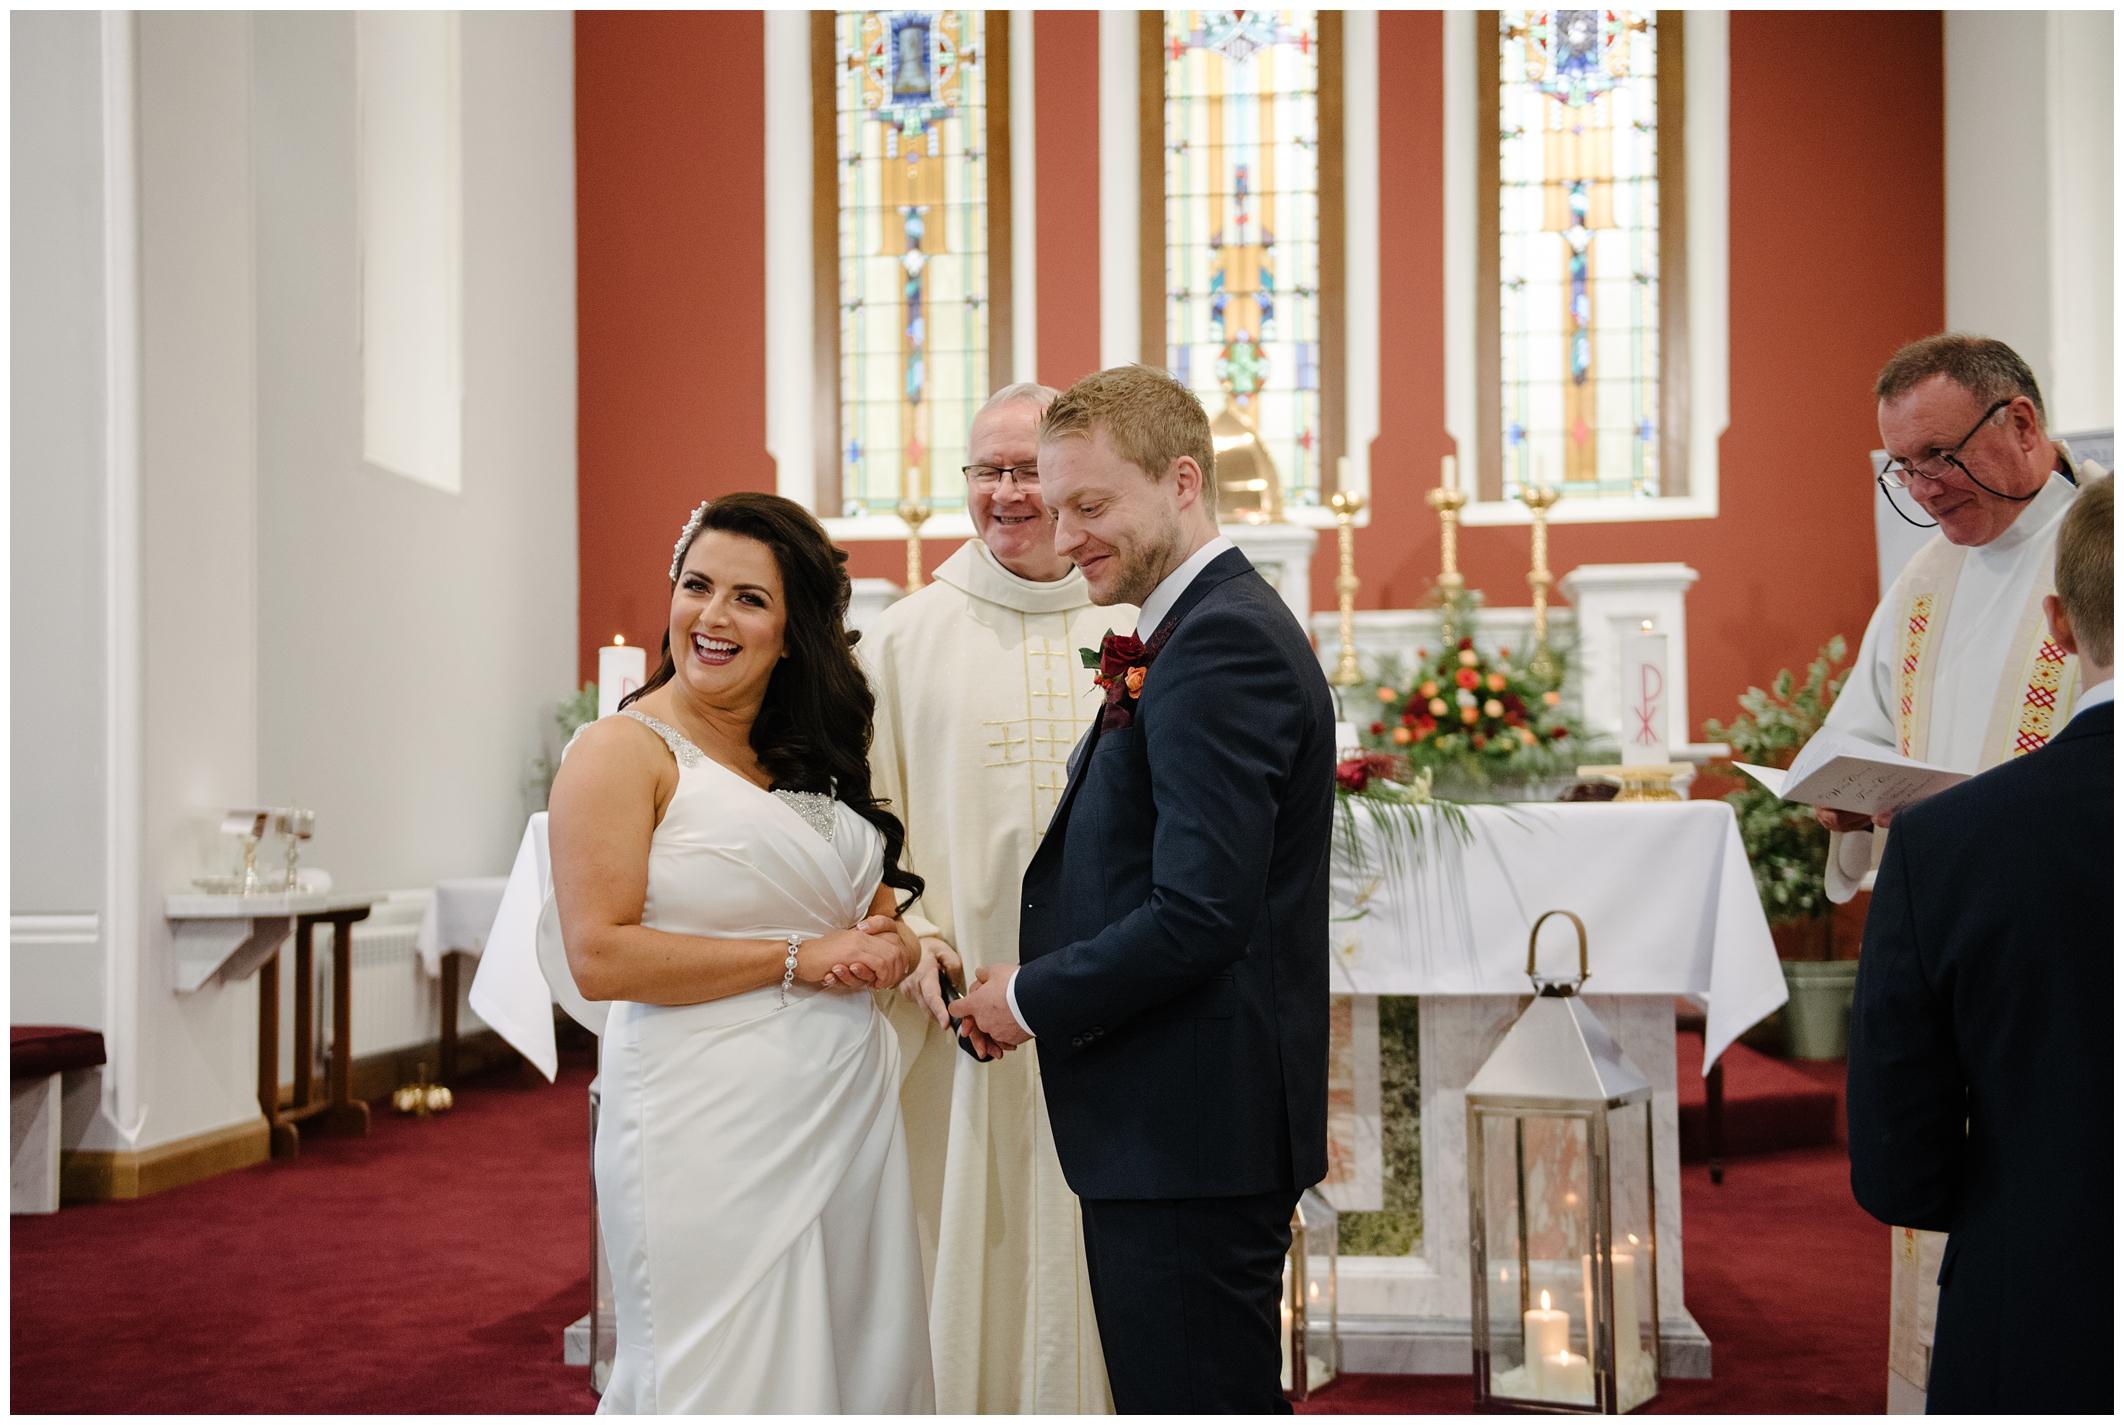 tracey_conor__wedding_jude_browne_photography_0031.jpg